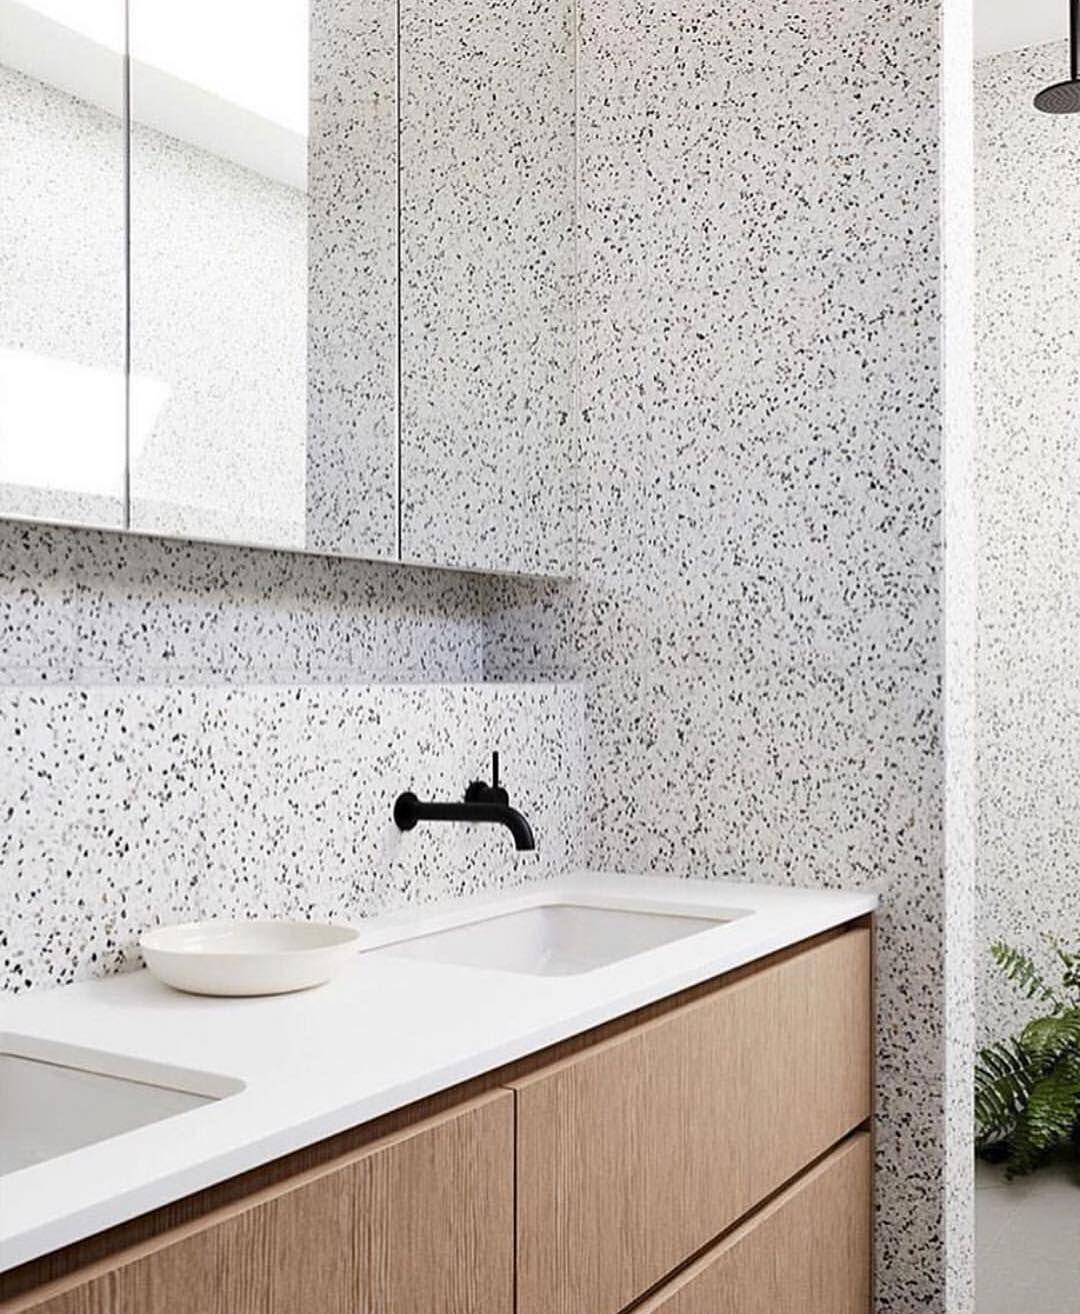 Terrazzo Bathroom Inspiration Bathroom decor, Luxury